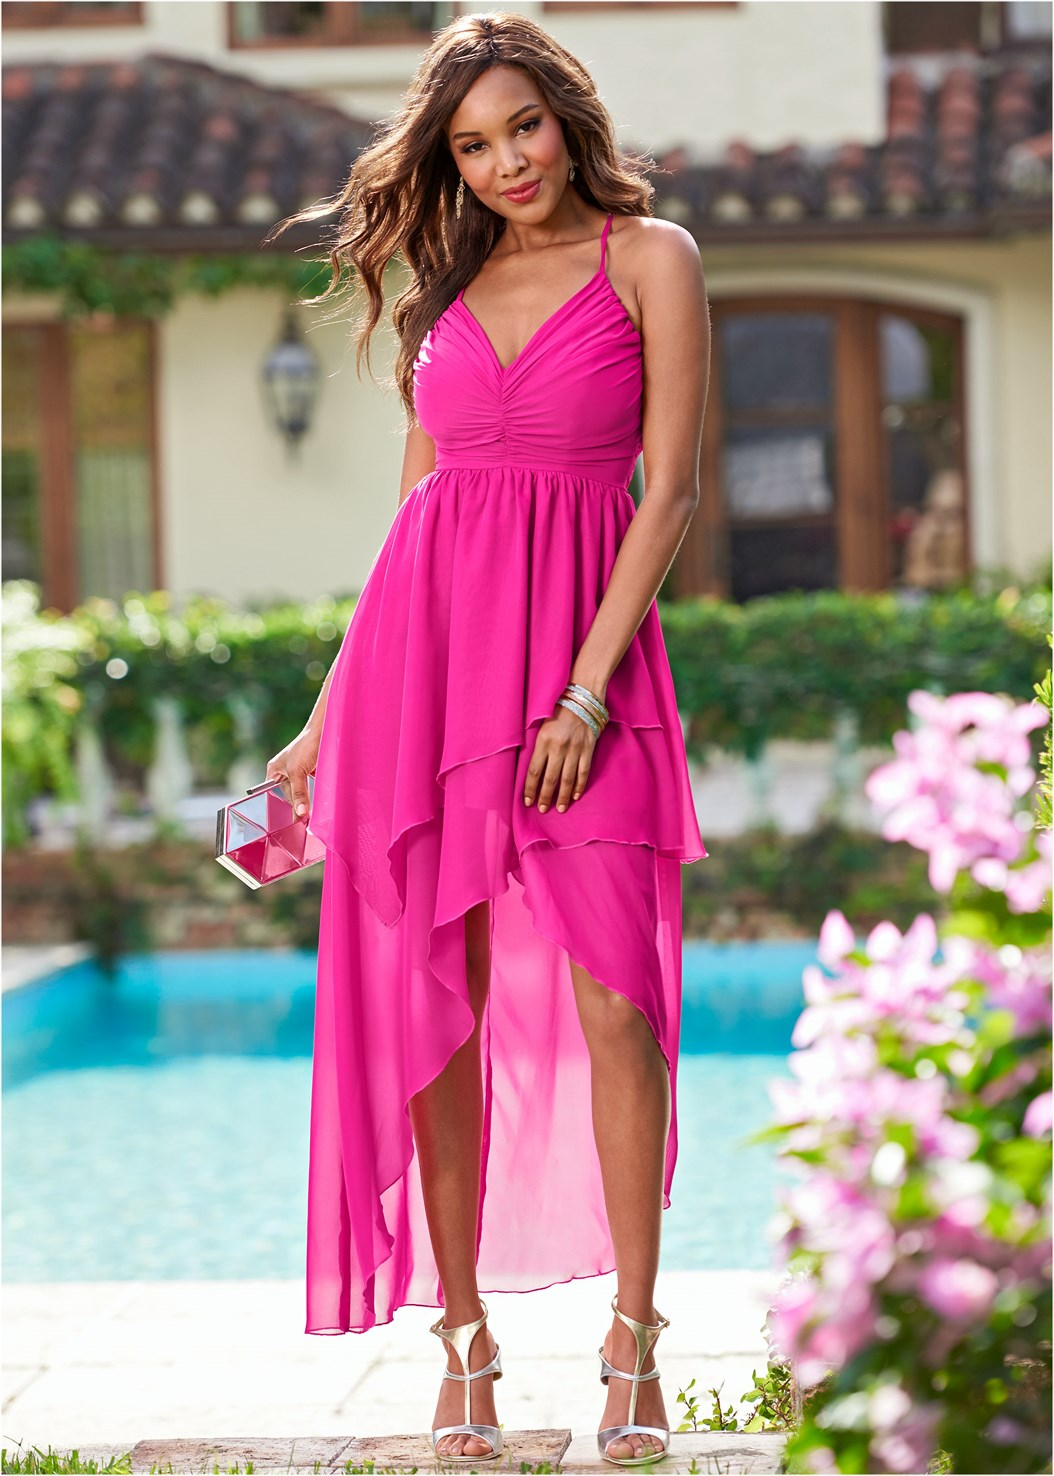 Ruffle Detail Long Dress,High Heel Strappy Sandals